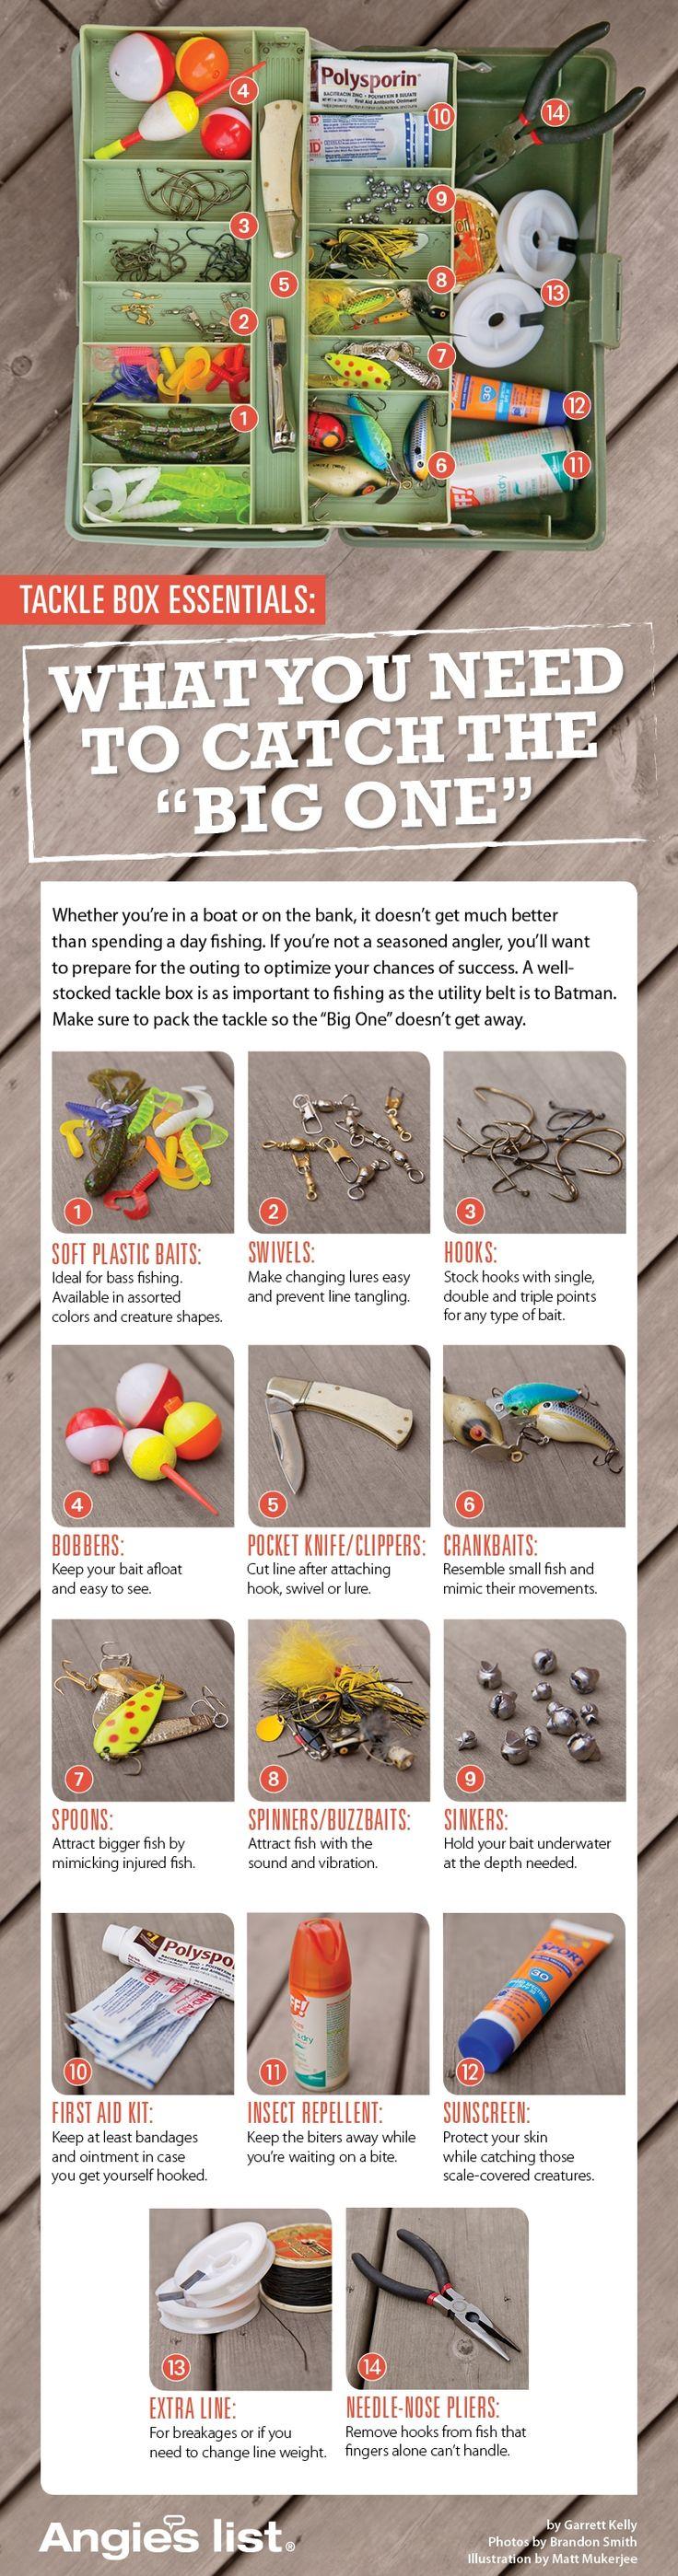 tackle box essential gear